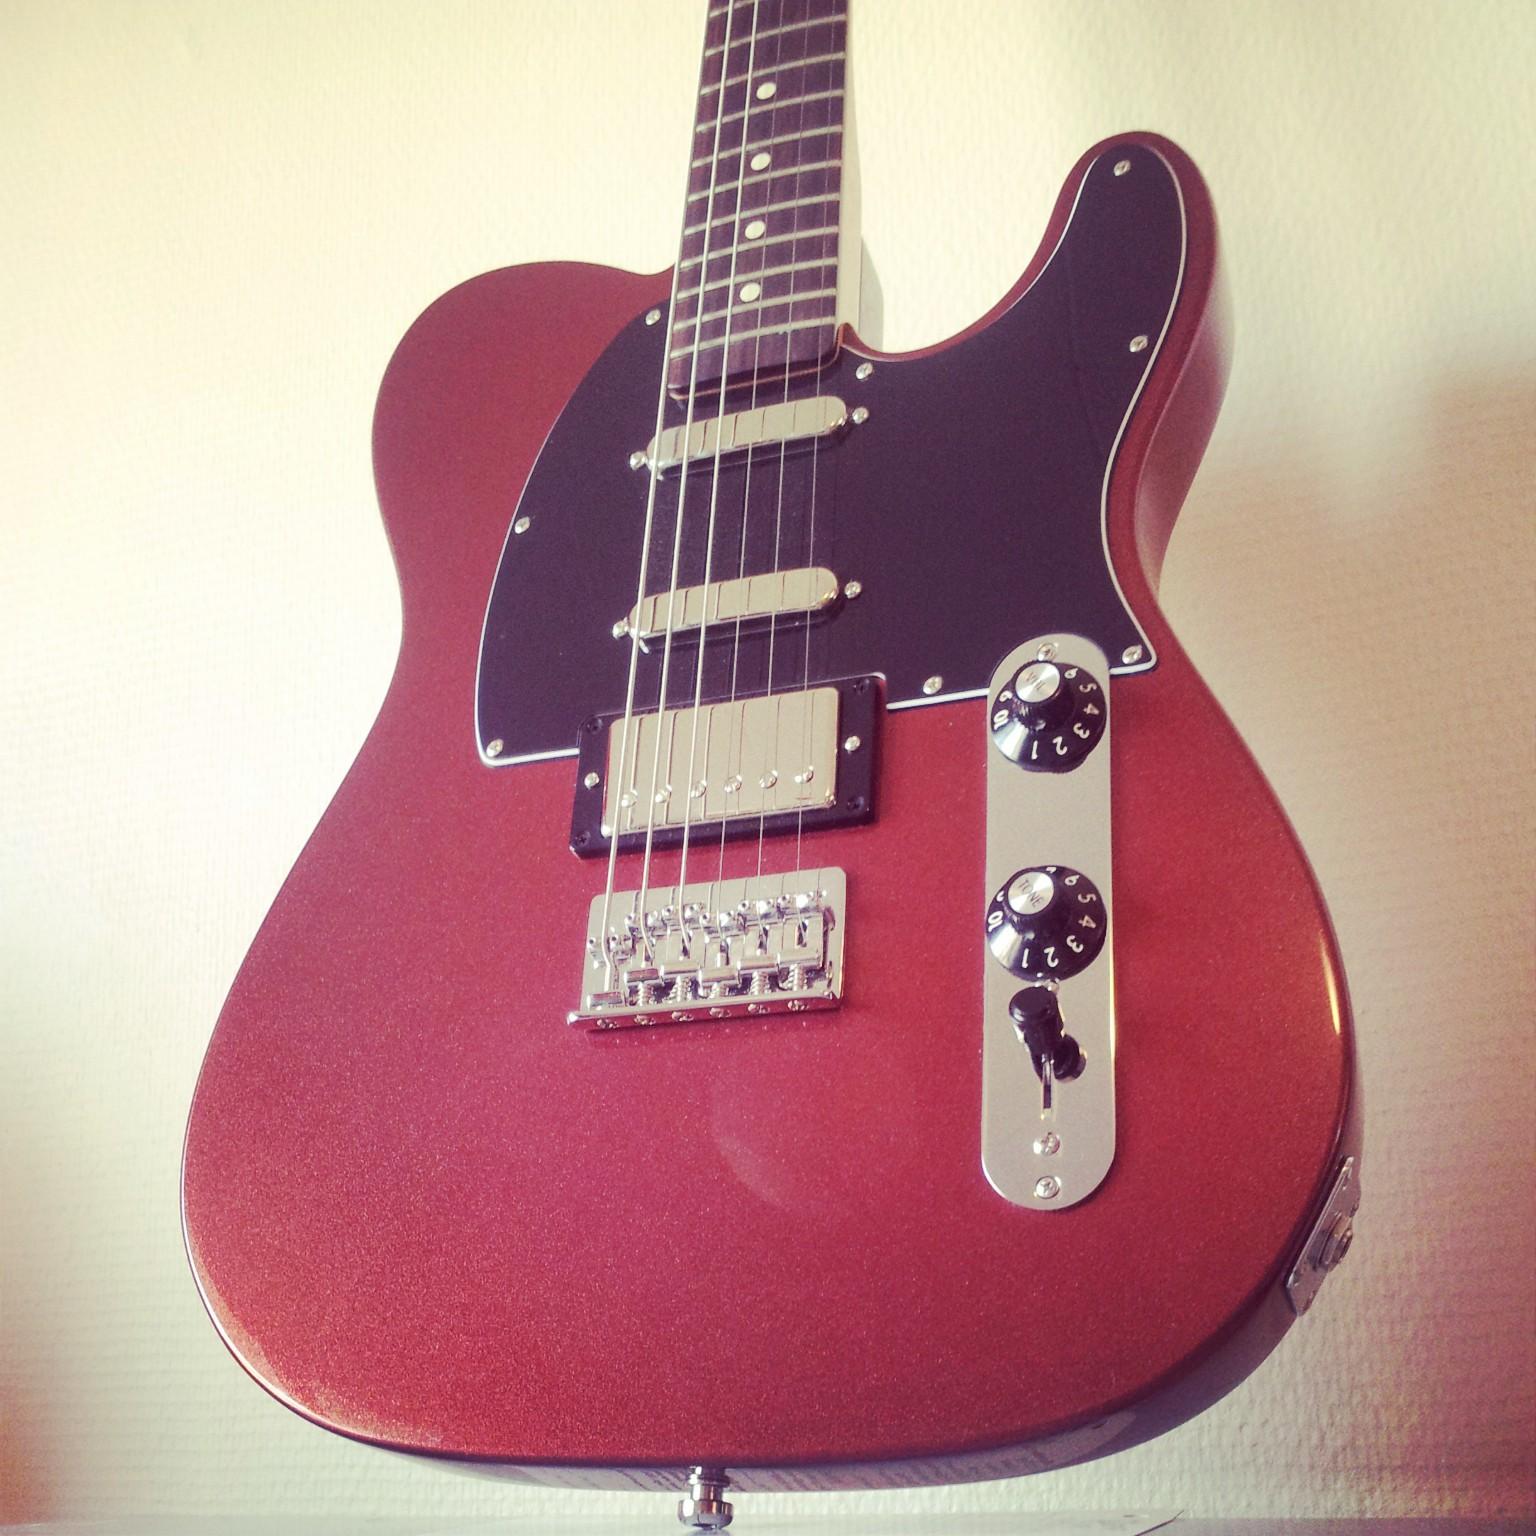 Fender Telecaster Blacktop Red 2012 Baritone Wiring Diagram Download